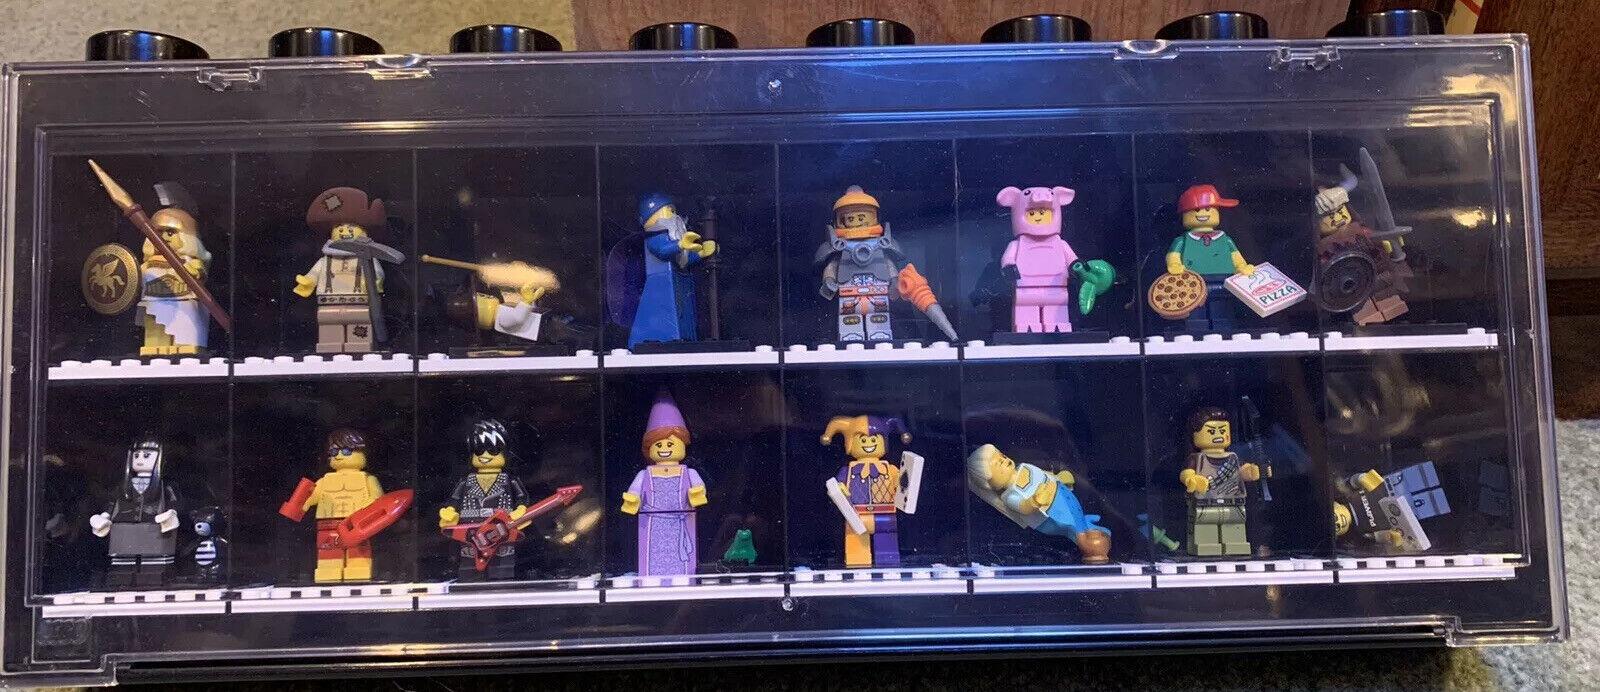 "2013 Big 17"" LEGO MINIFIGURES SET COMPLETE + Display Case KISS, Pizza, Jester ++"